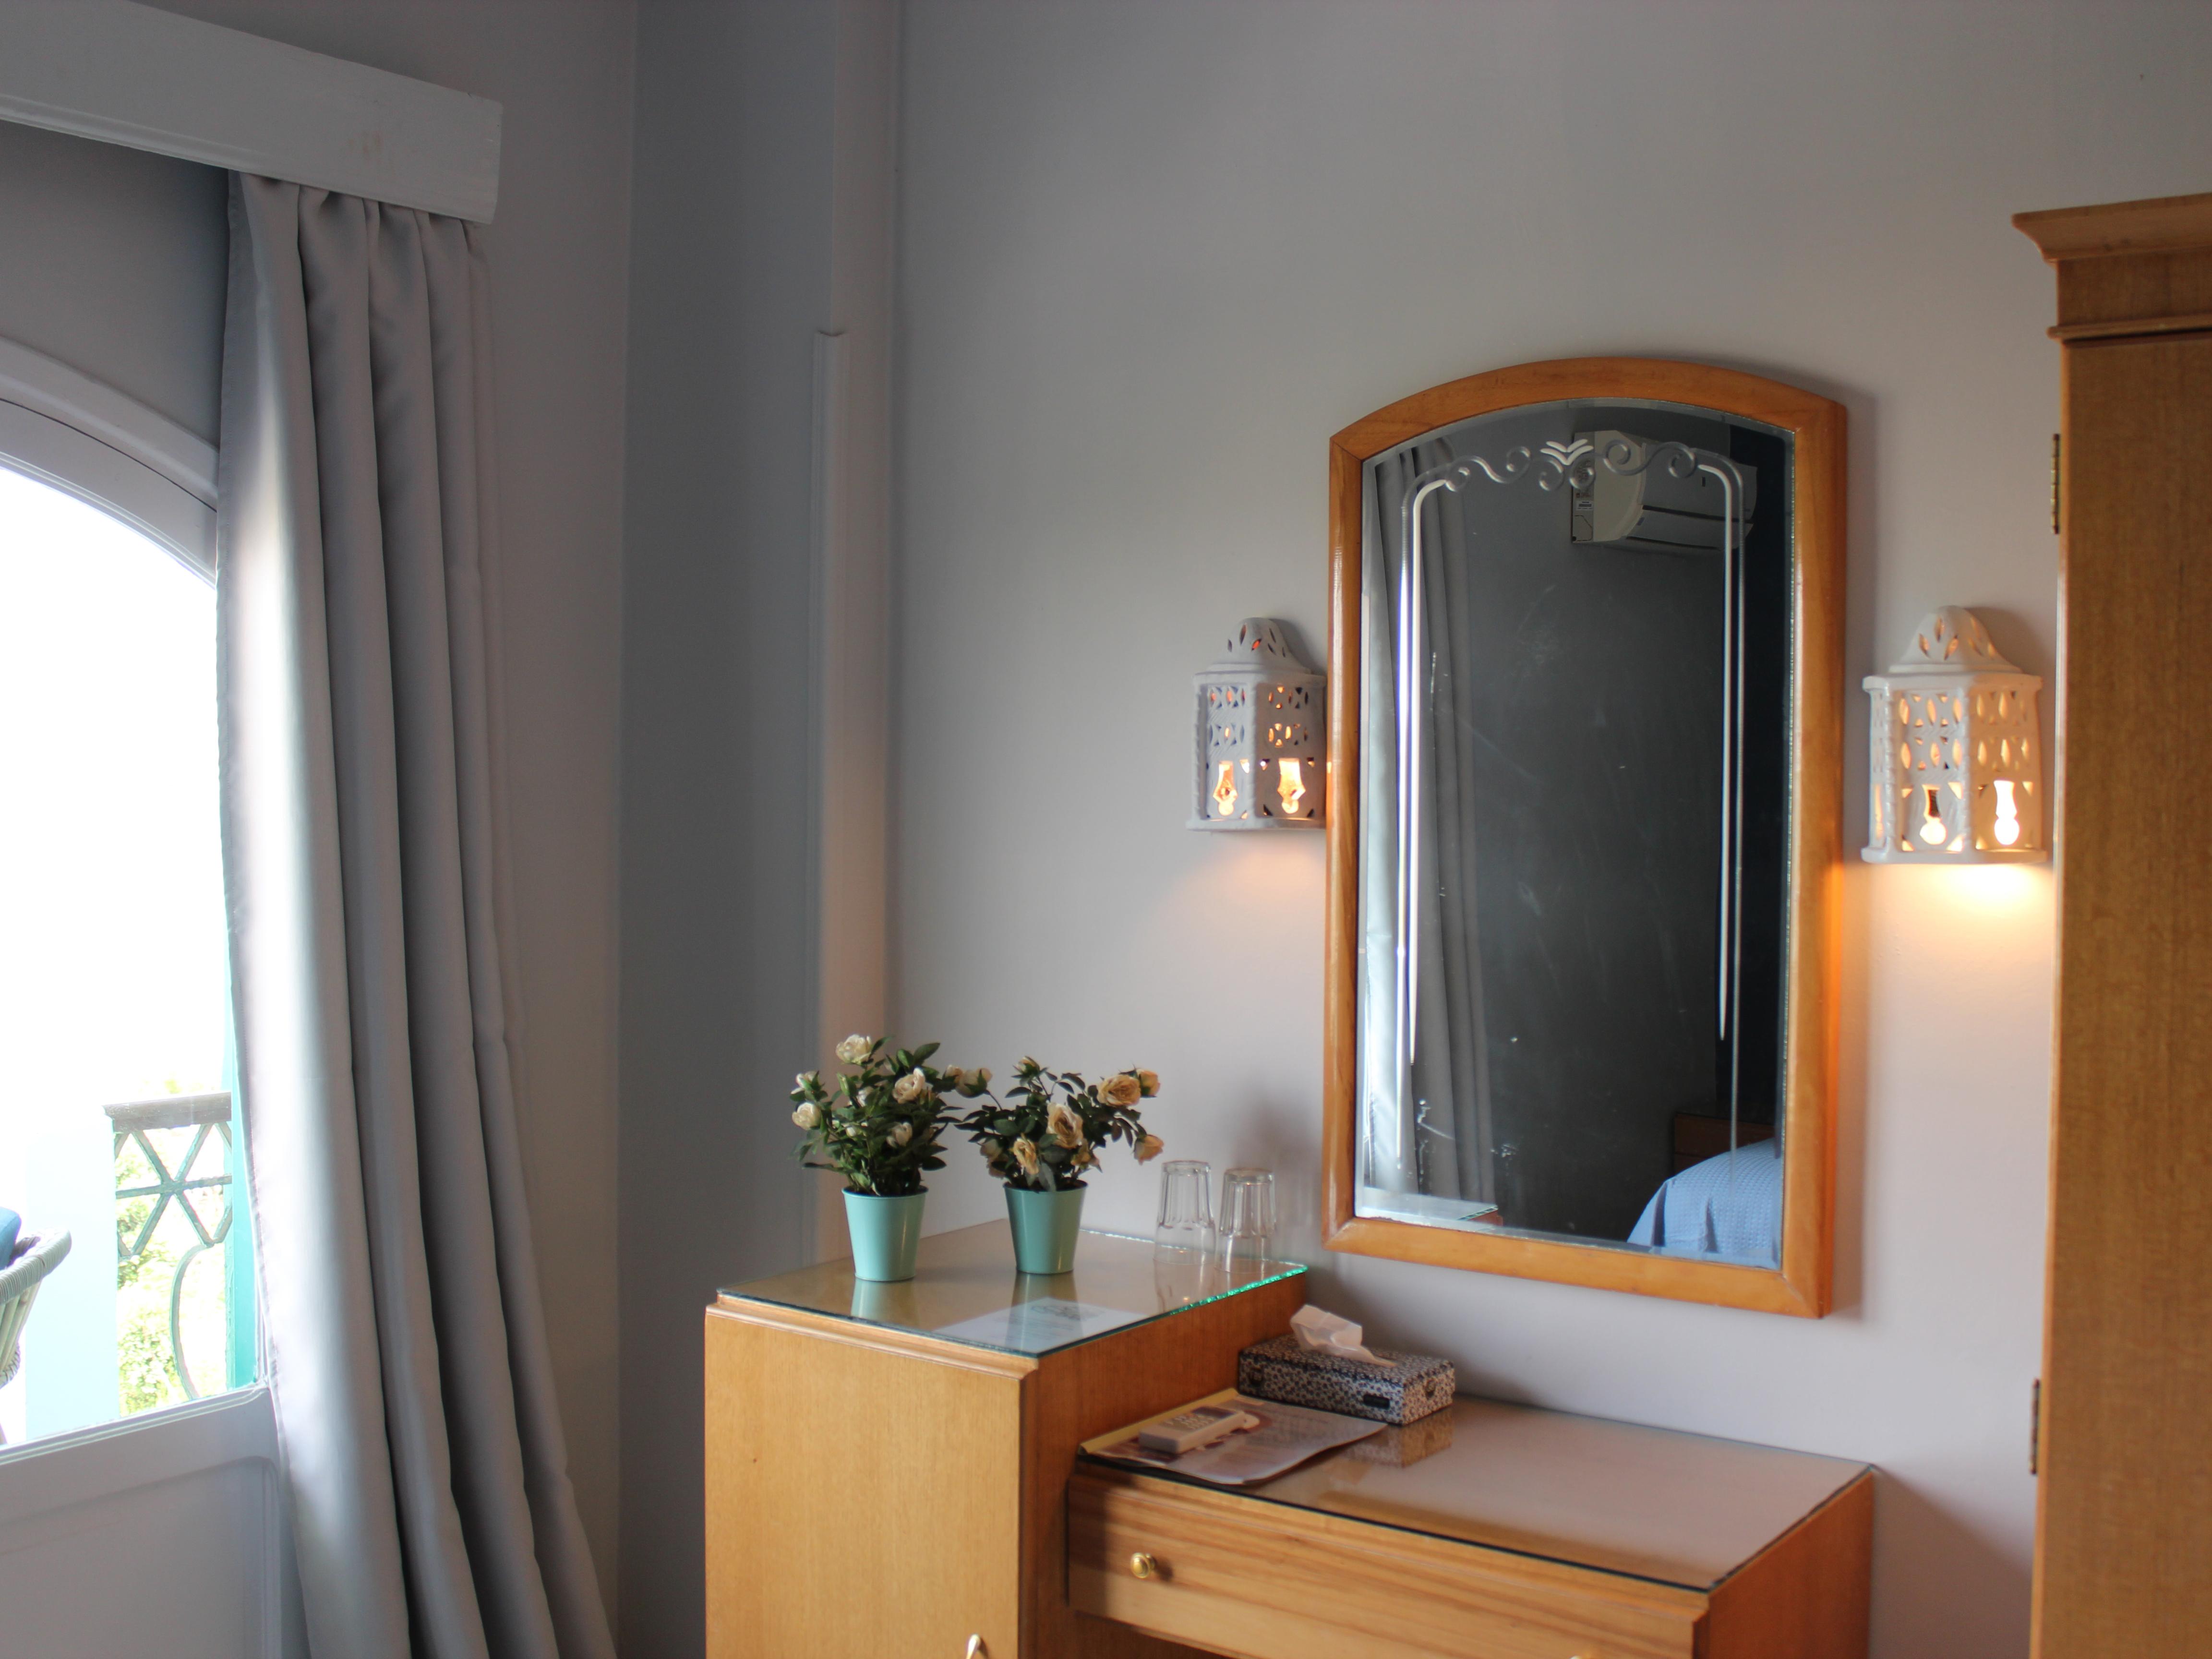 The rooms nemo dive club hotel - Deco kamer volwassen blauw ...